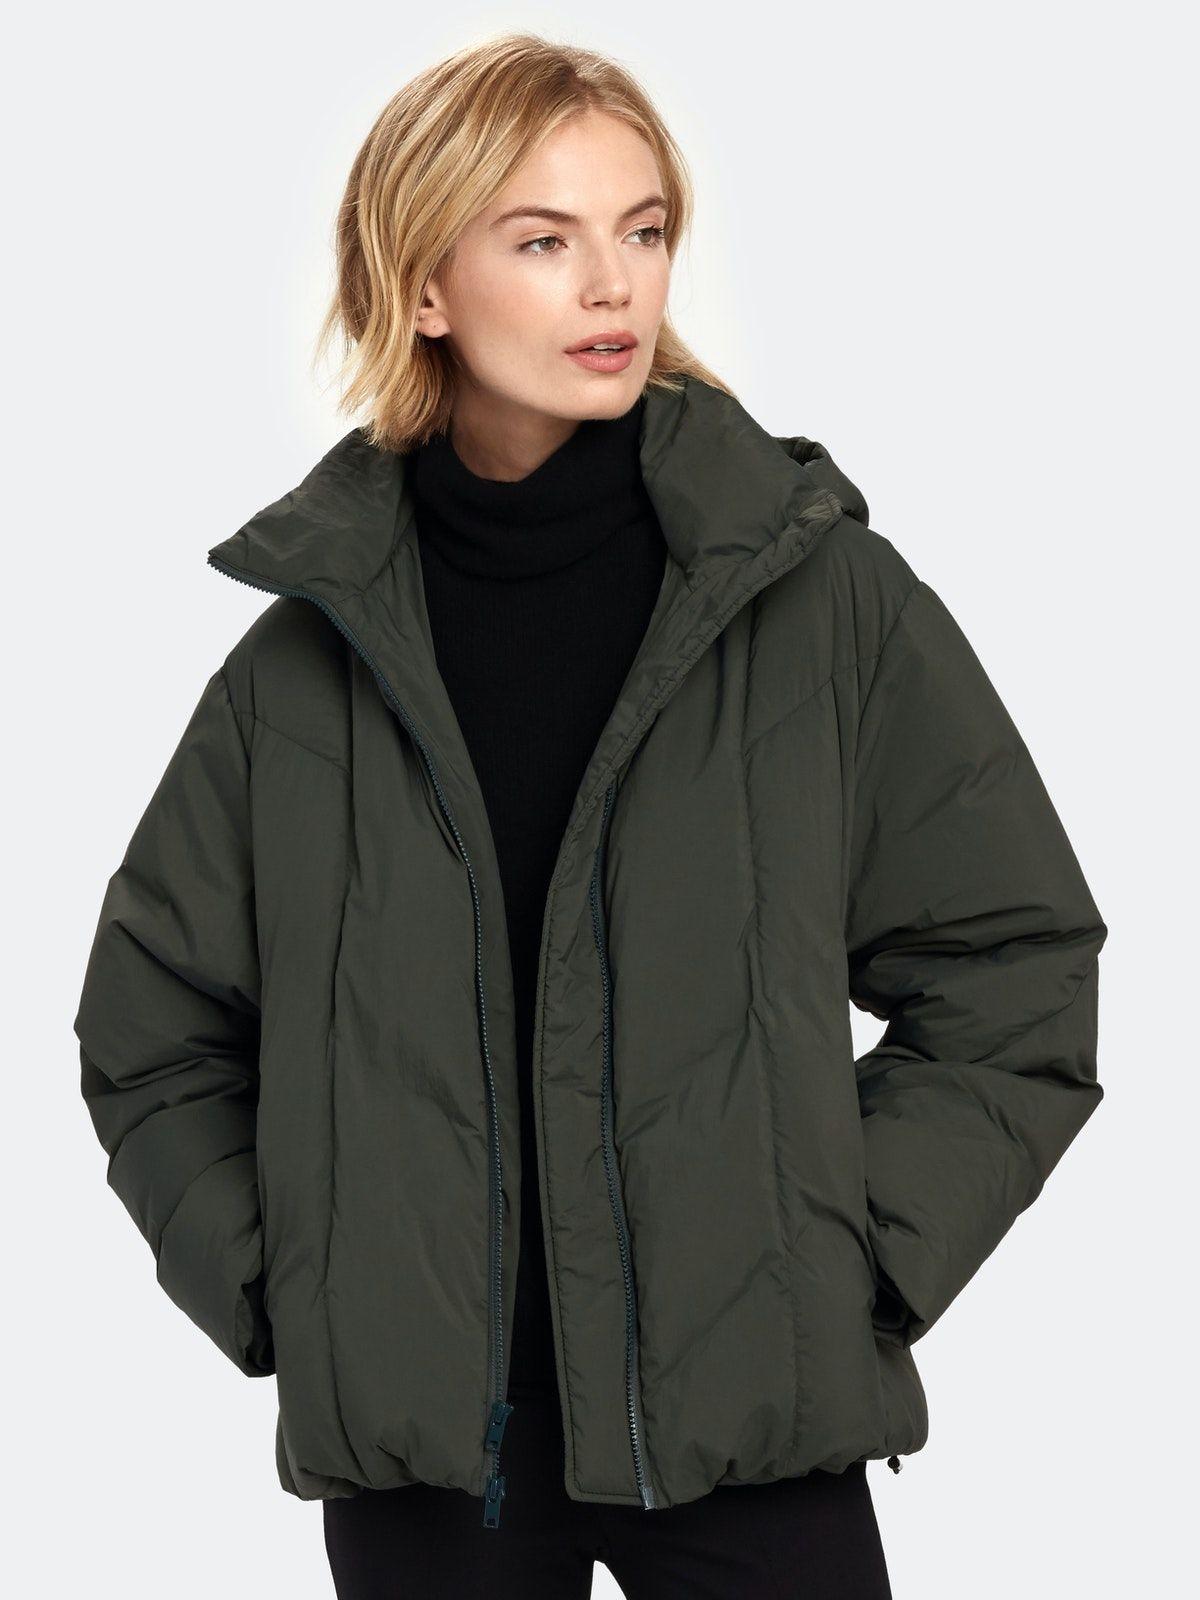 Vince Hooded Puffer Jacket Jackets Puffer Jackets Trendy Fall Coat [ 1600 x 1200 Pixel ]